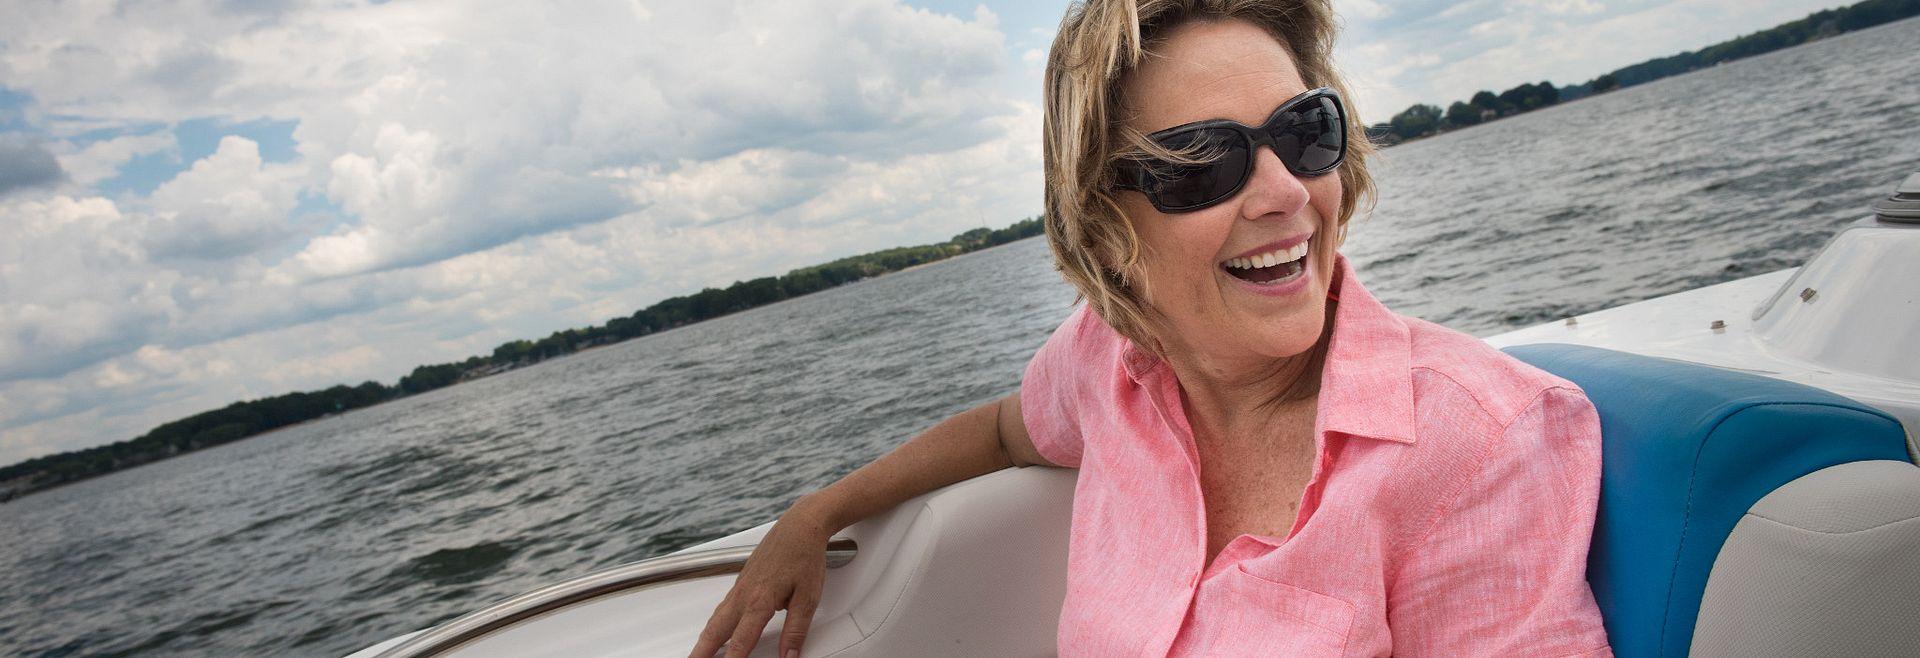 lady on Lake Norman